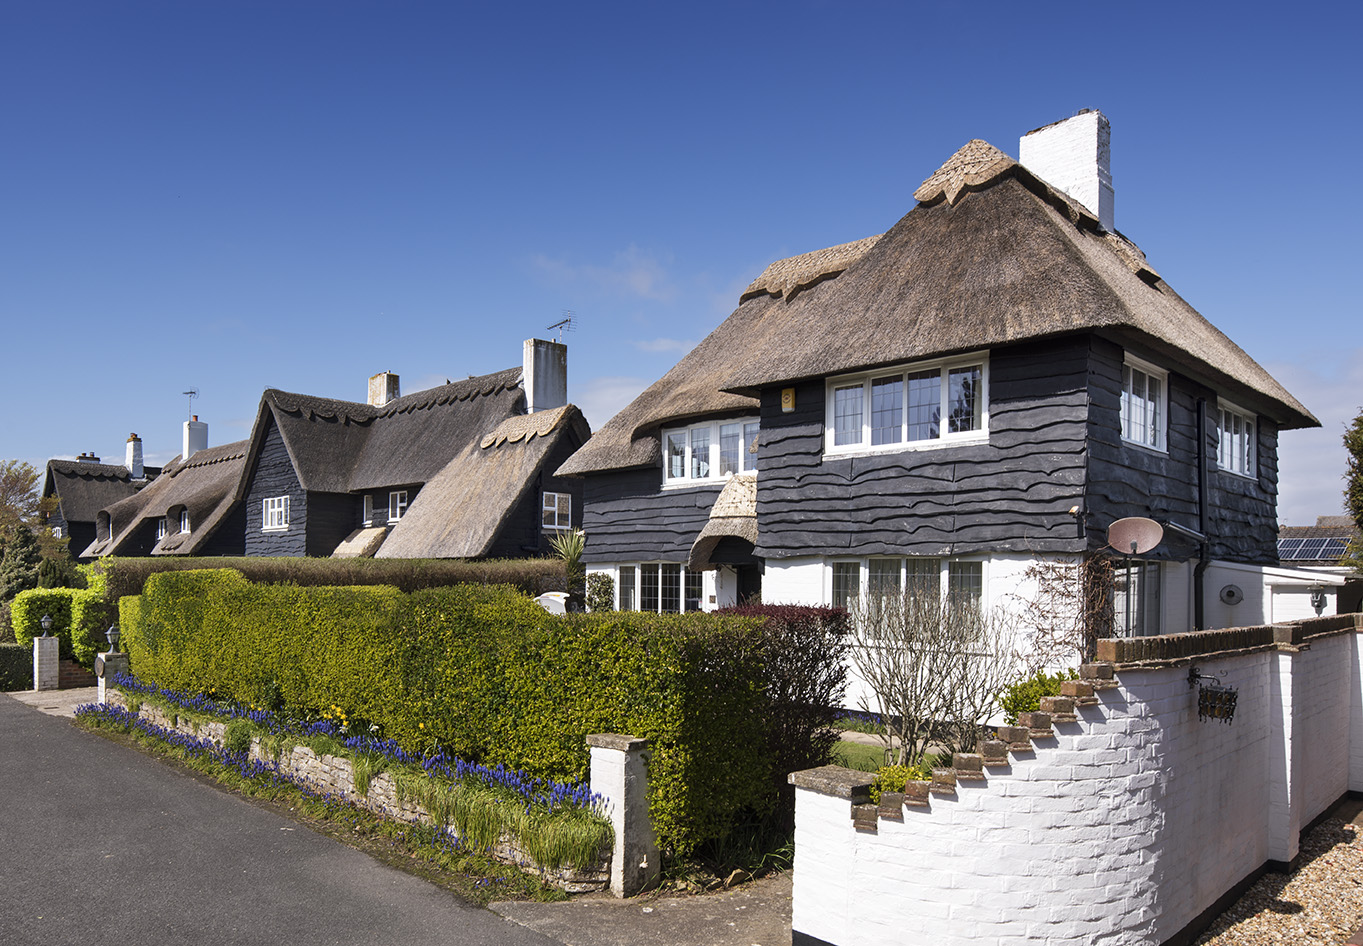 Bognor Regis, Aldwick Bay Estate, The Fairway, houses, by P.D. Hepworth c. 1934